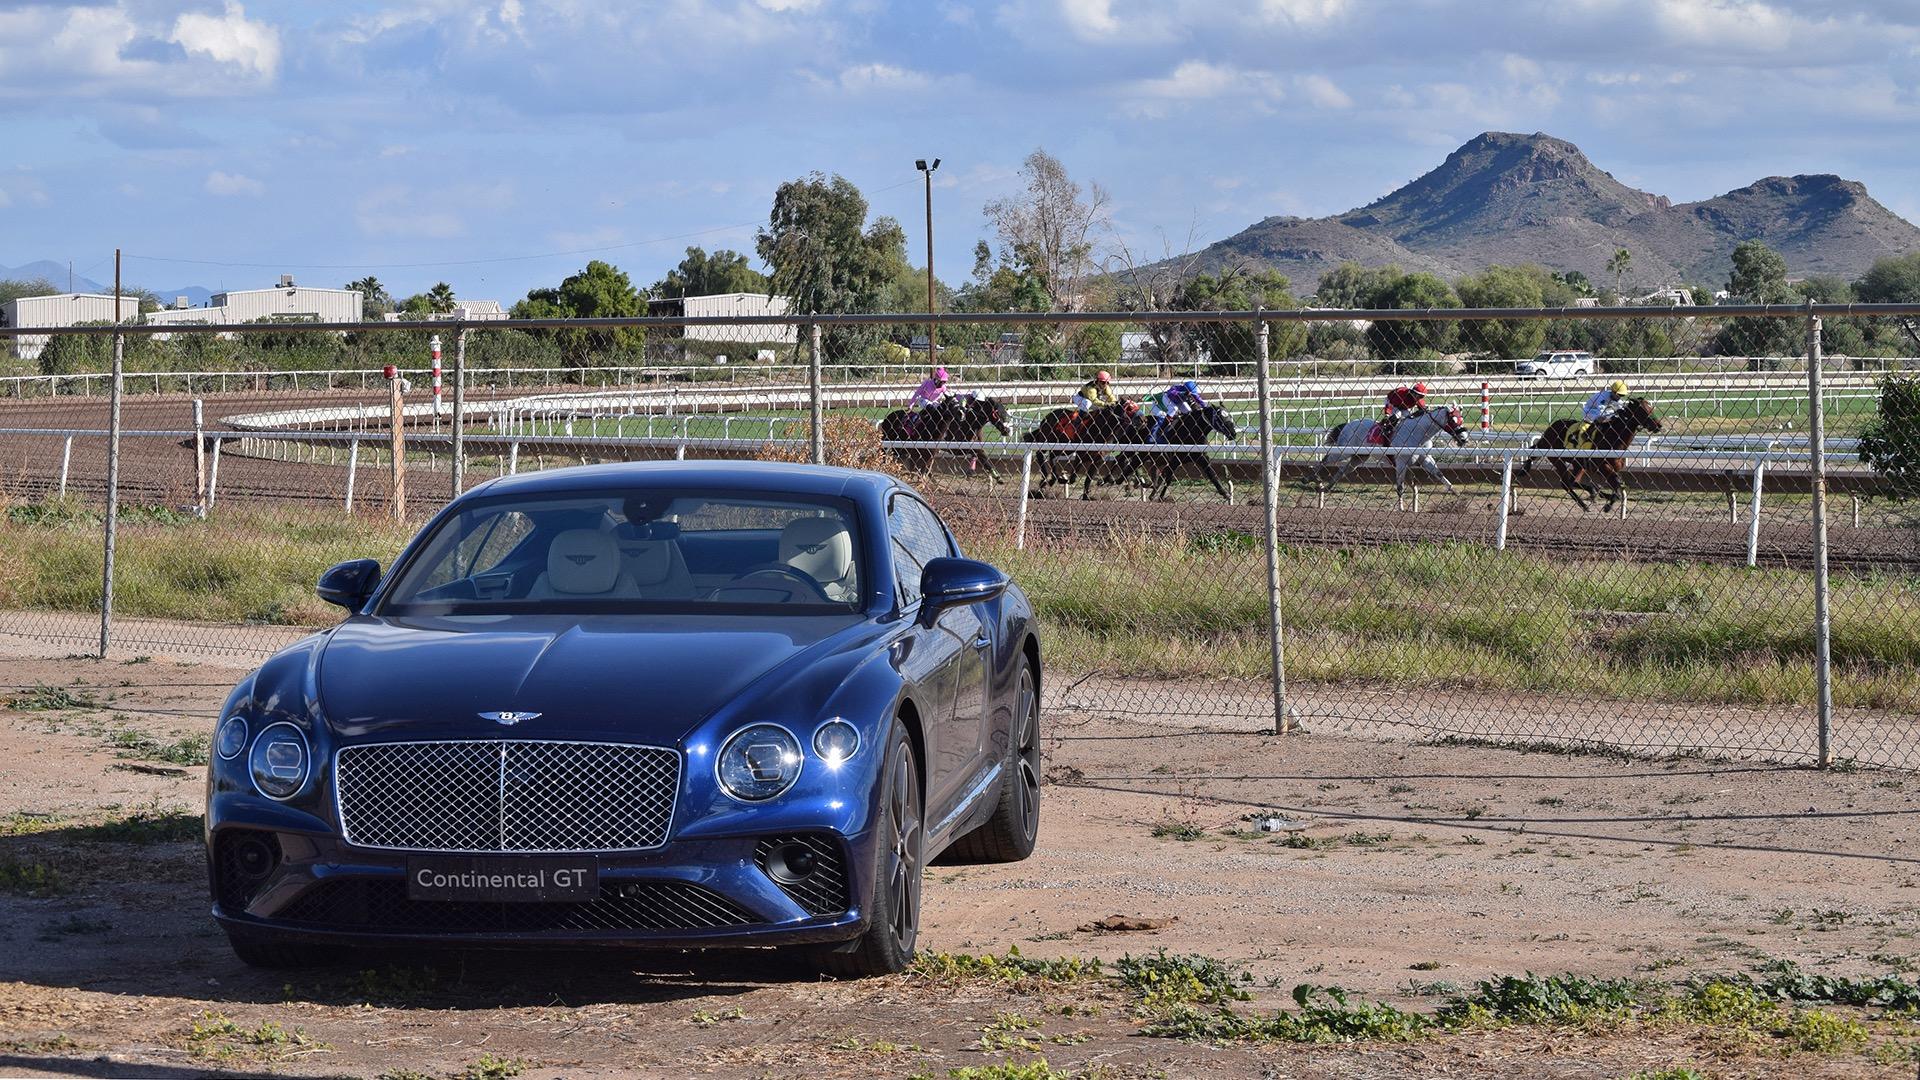 Bentley Continental GT arizona desert self driving cars